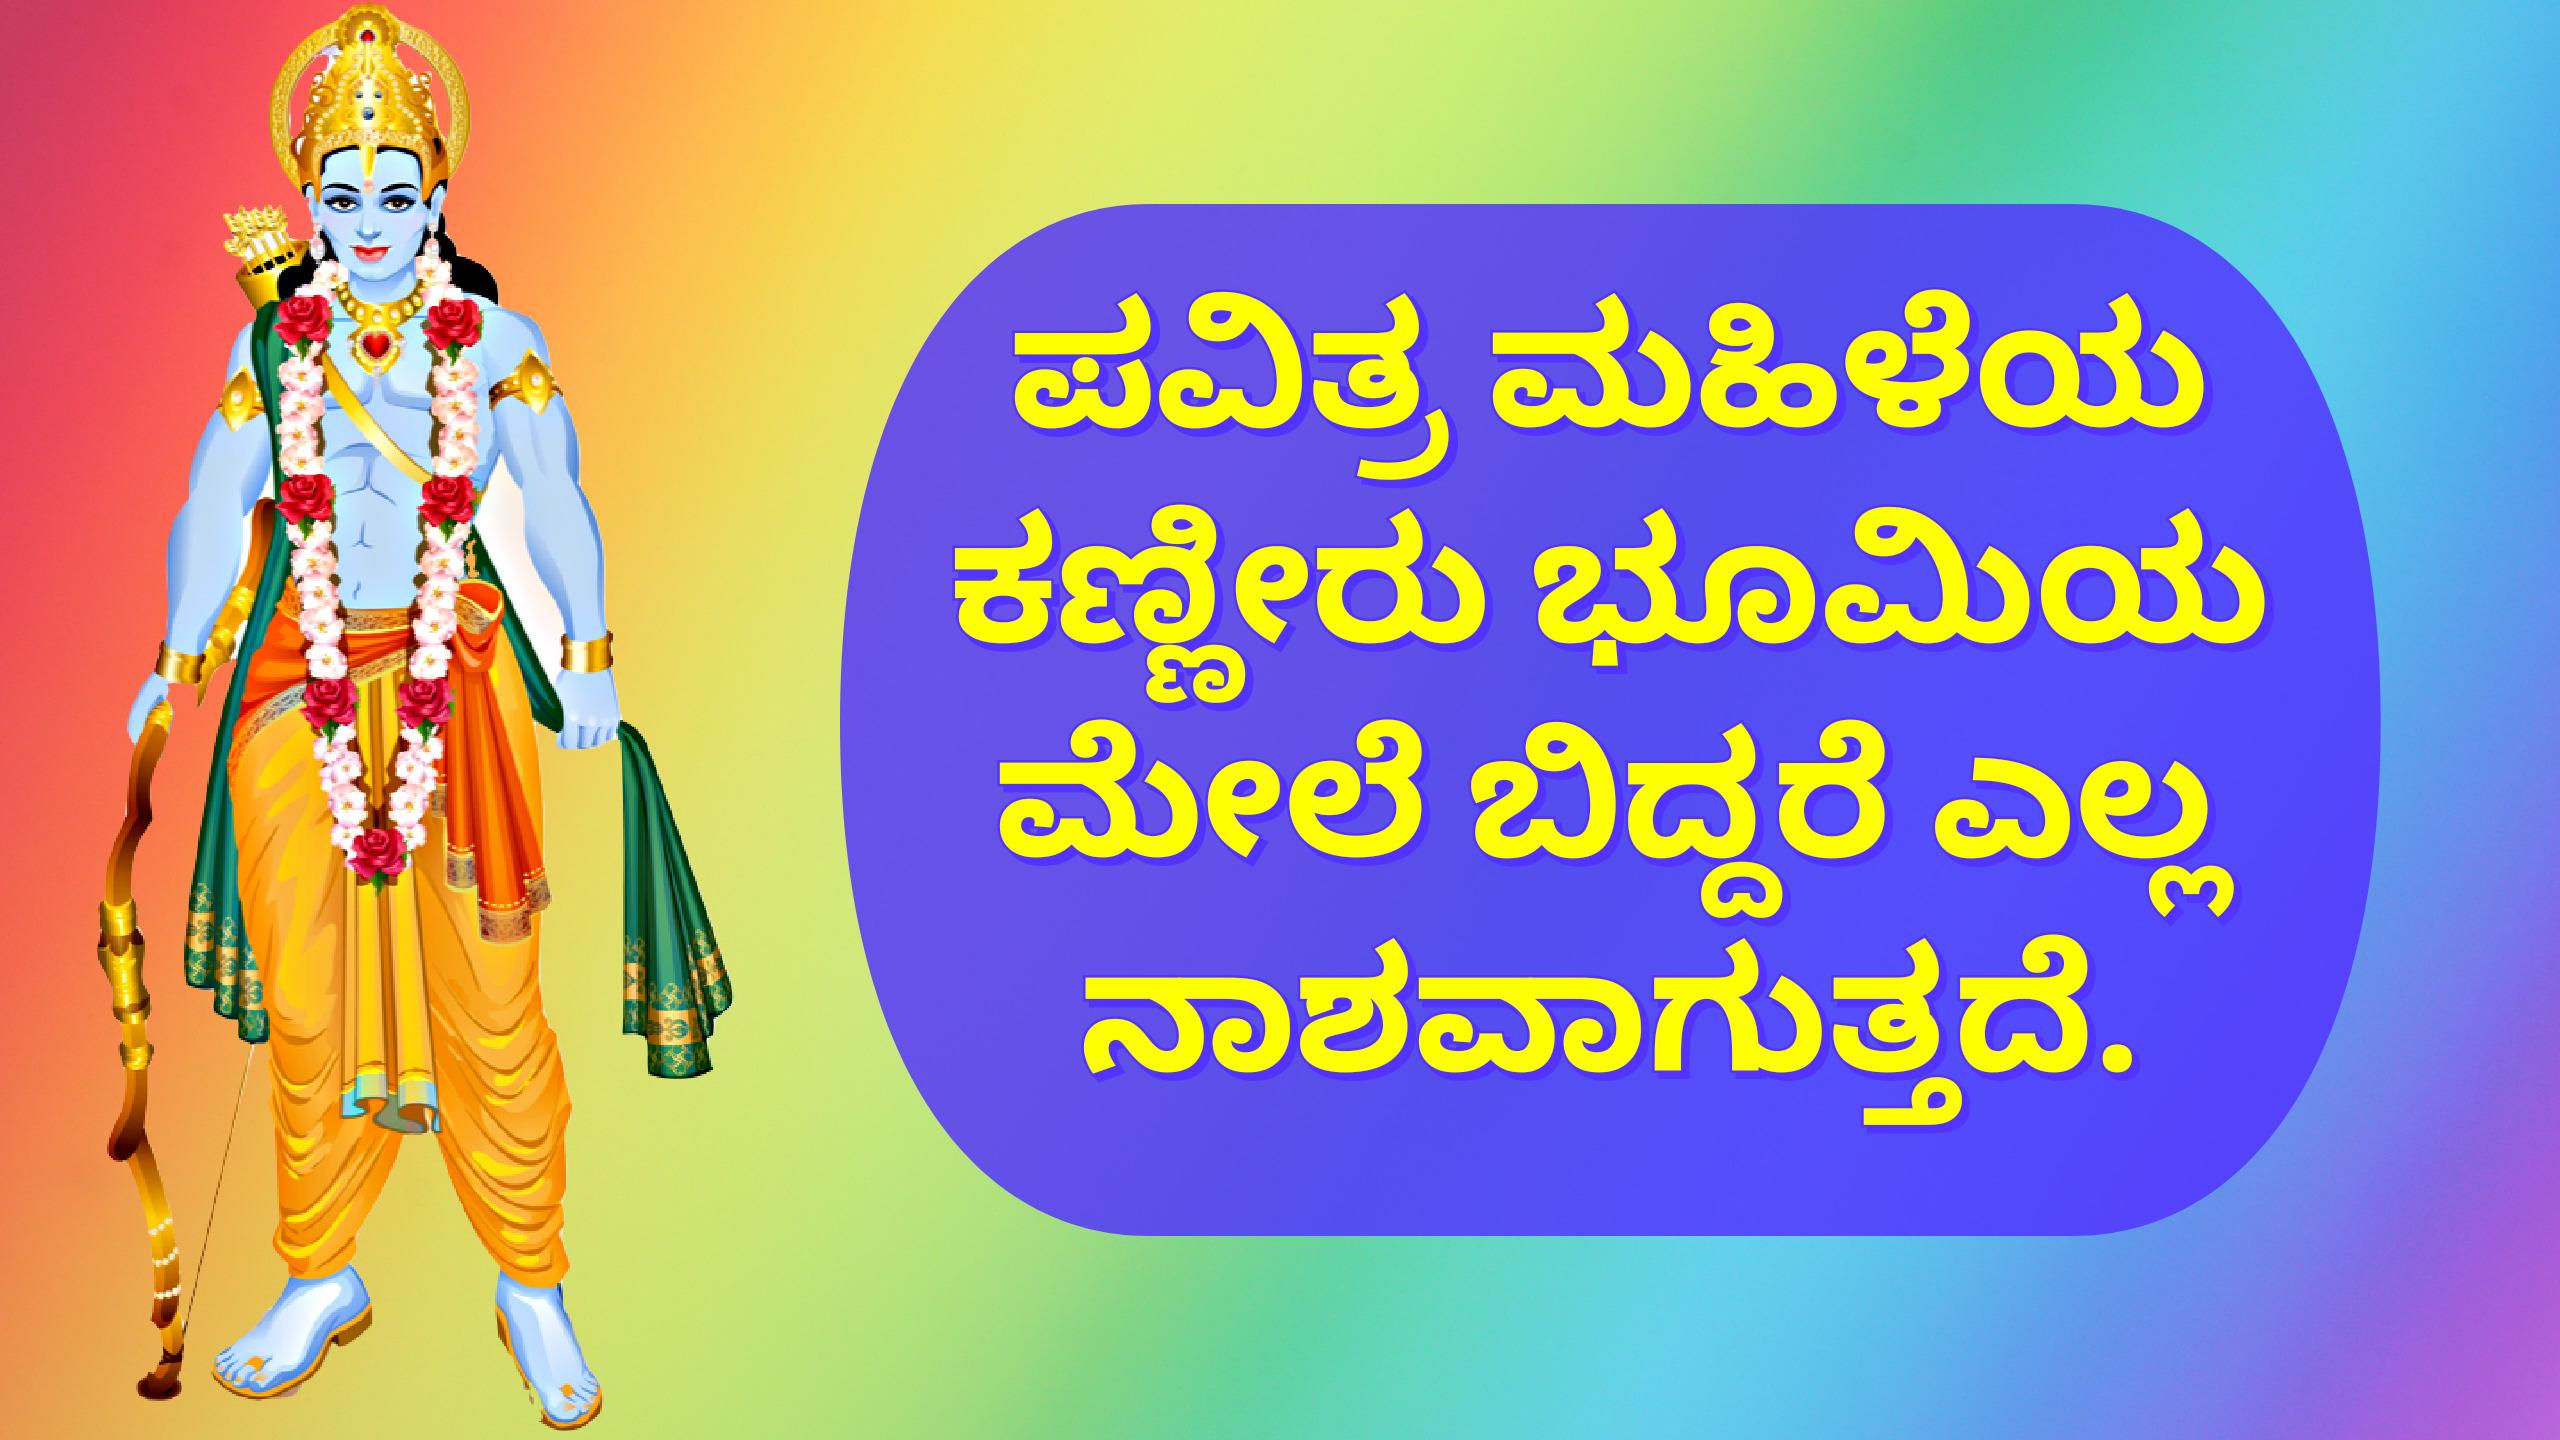 21. Shree Ram Quotes in Kannada